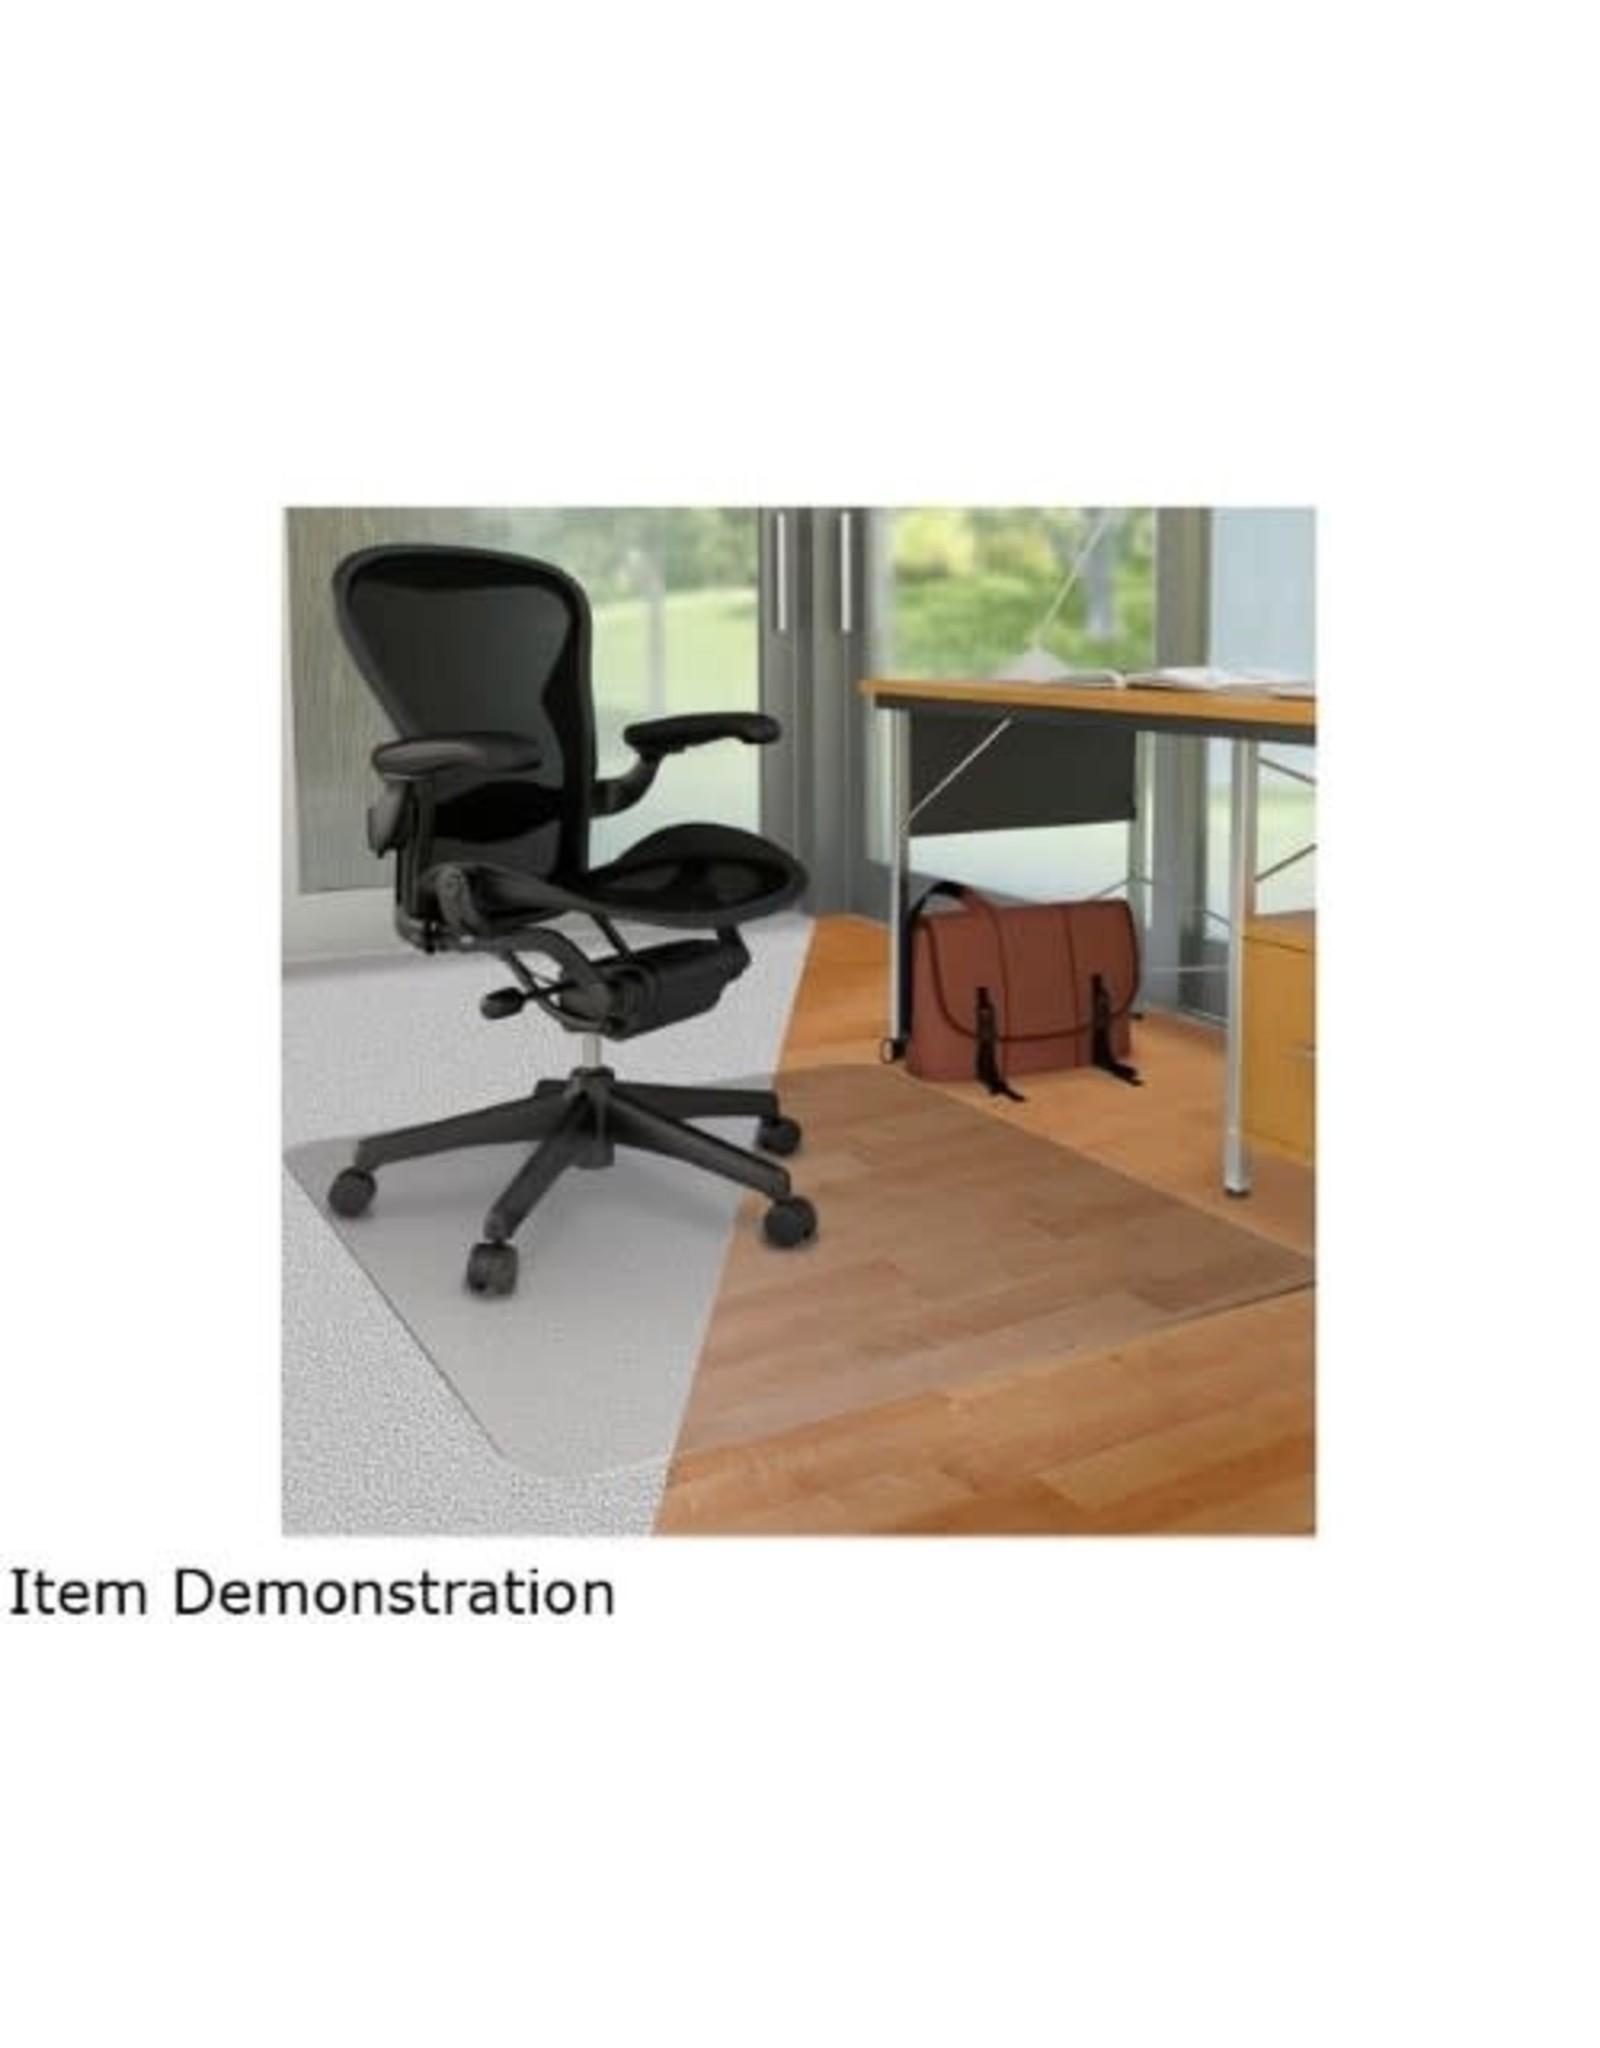 Deflecto CHAIRMAT-DUOMAT, CARPET/HARD FLOOR 36X48